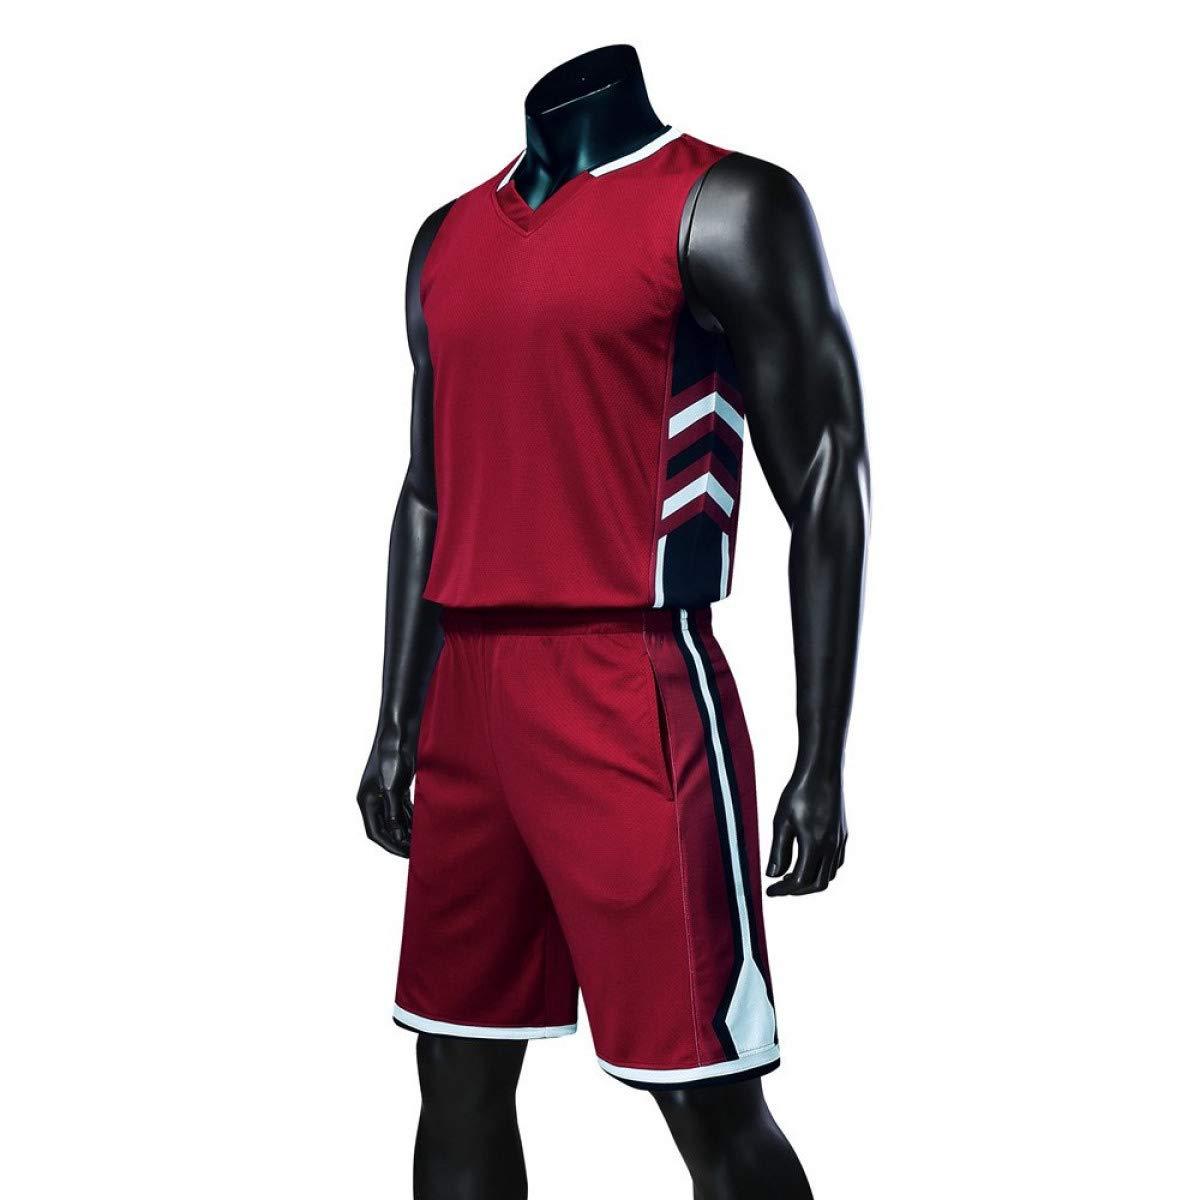 Men Women Blank Team Basketball Jerseys Sets Sports Kit Training Suits Shirts